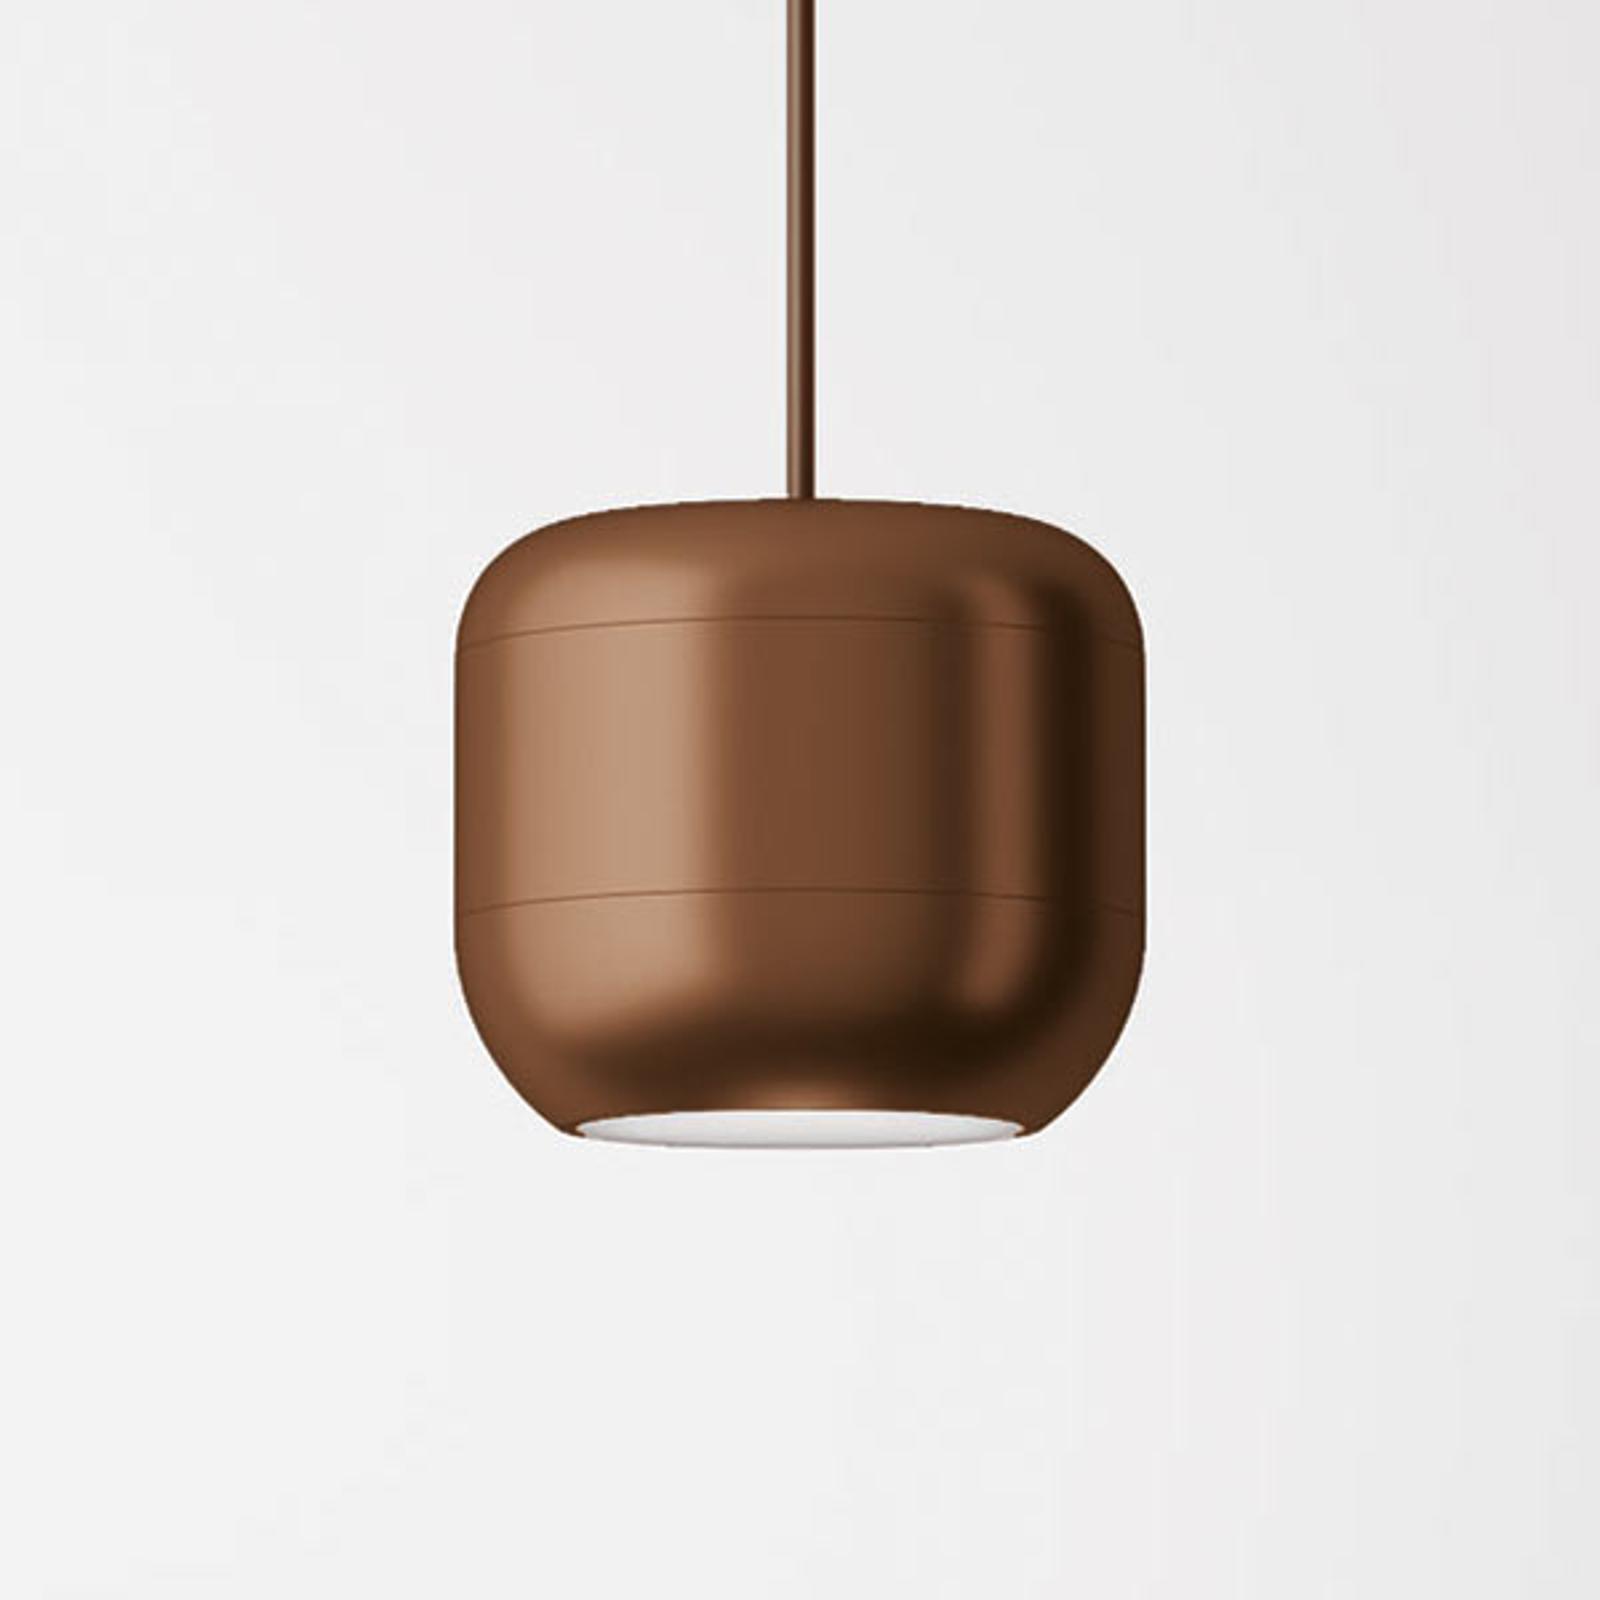 Axolight Urban LED-pendellampe 16 cm mat bronze